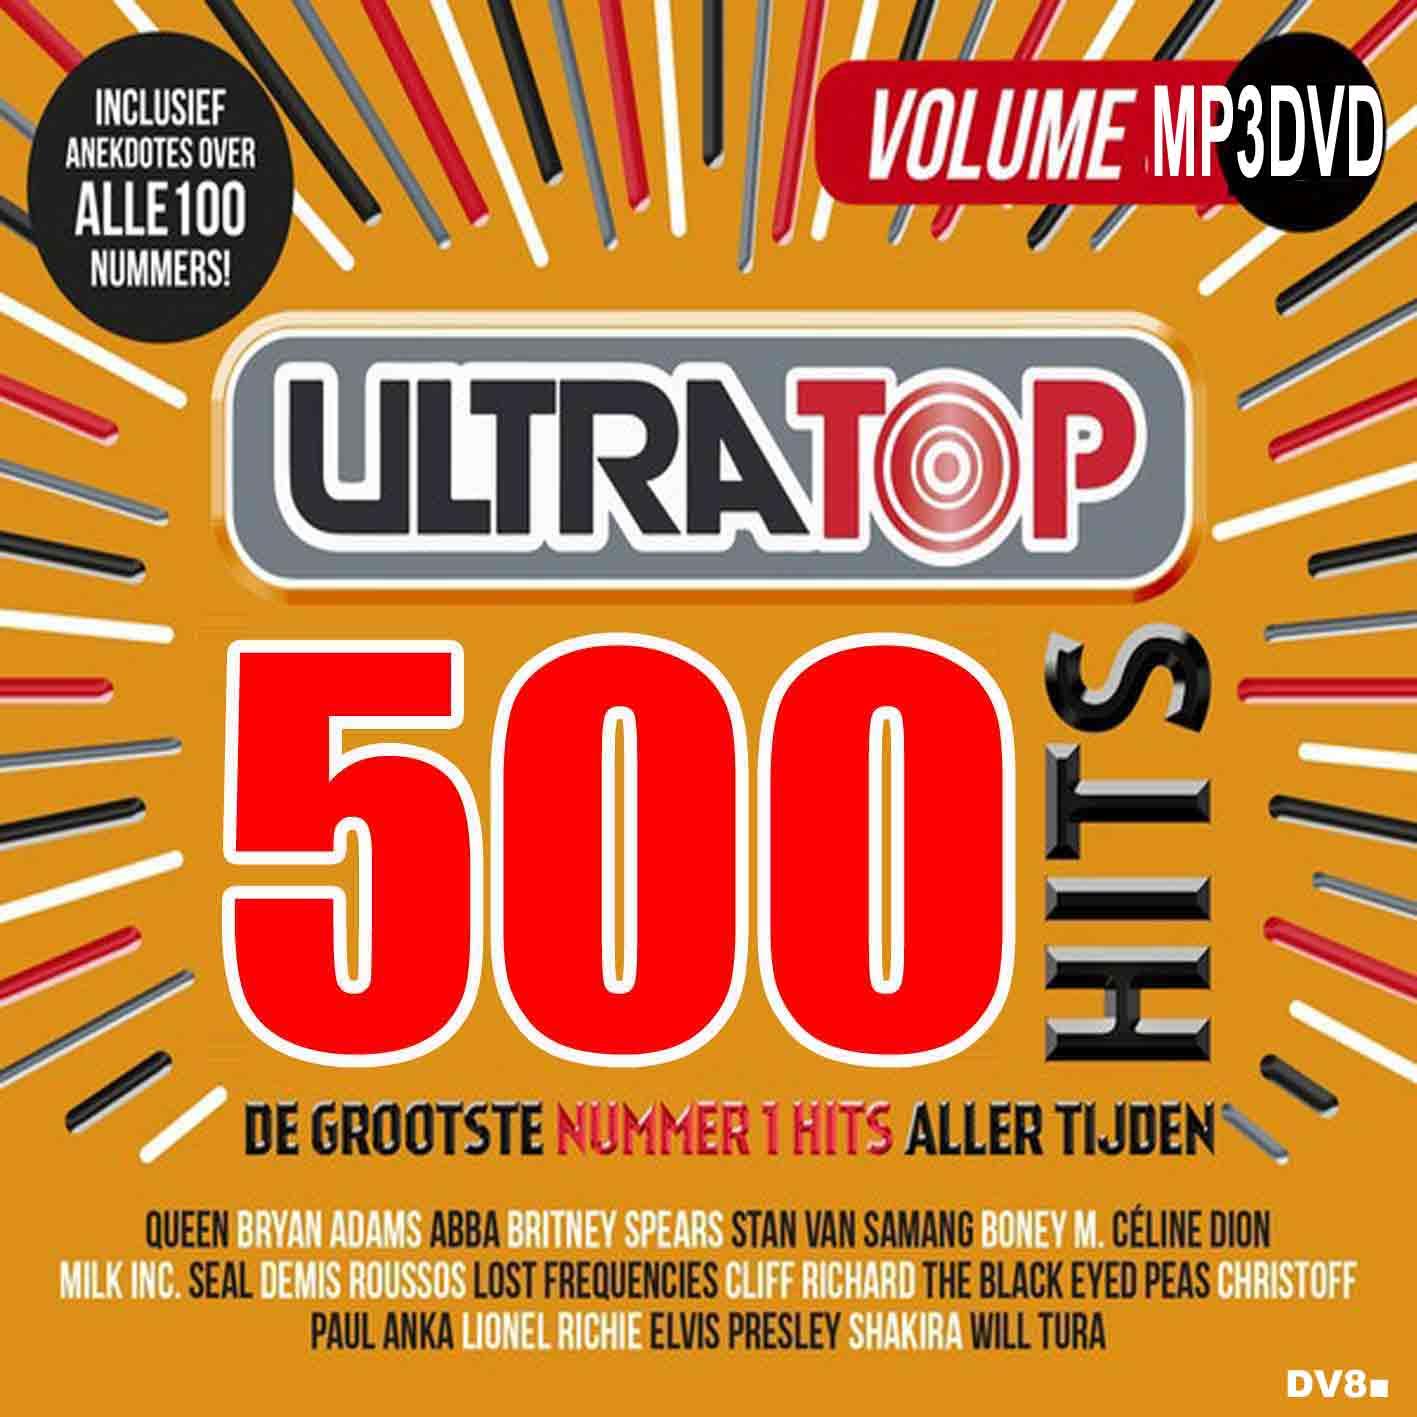 DV8■Ultratop 500 Hits (ABBA Queen Rihanna Elvis Presley Lady Gaga MP3DVD